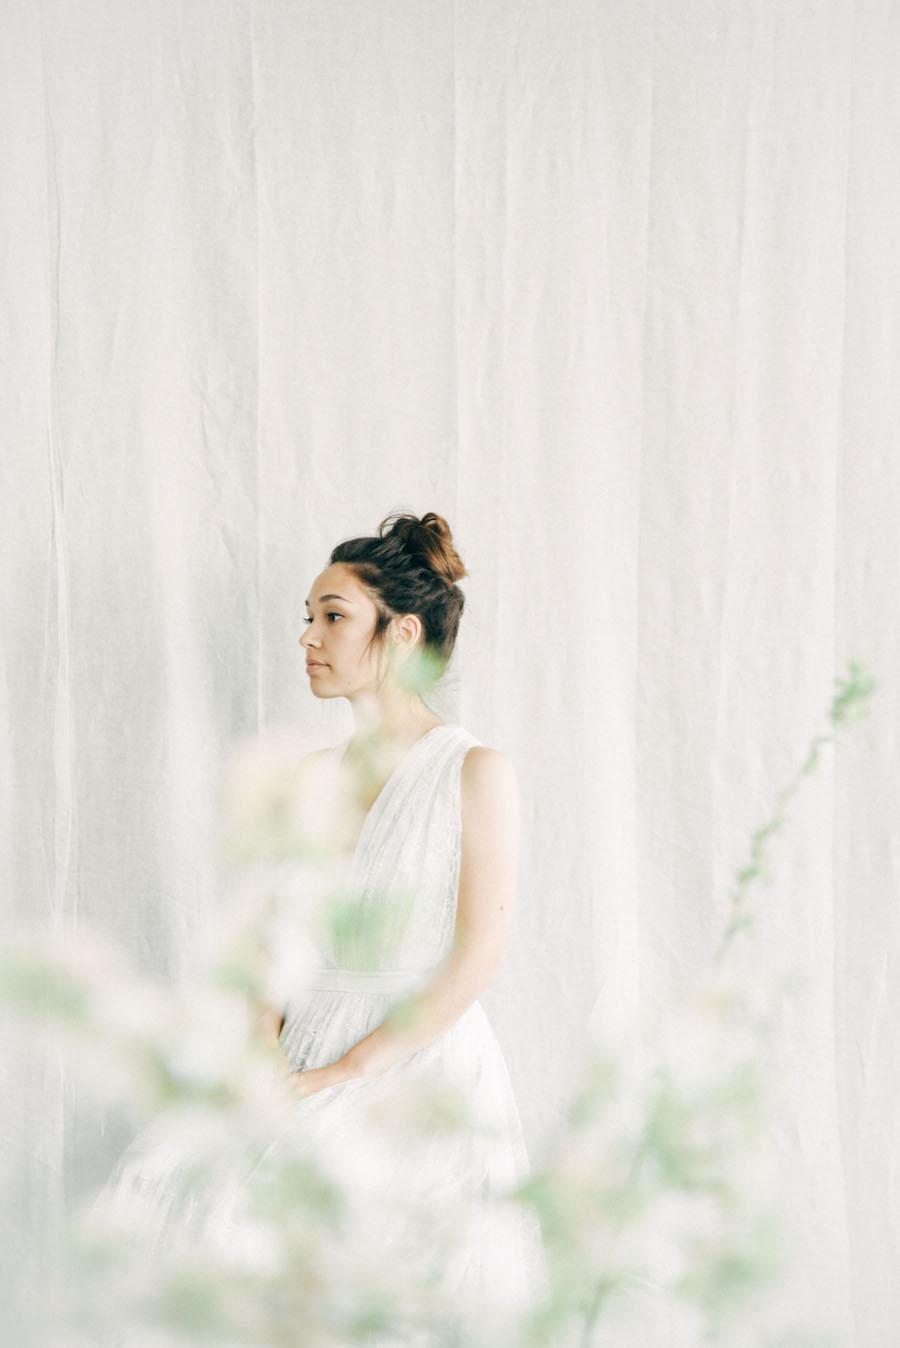 A bride waits. See more from Soil & Stem's Spring Floral Design Workshop now on Cottage Hill